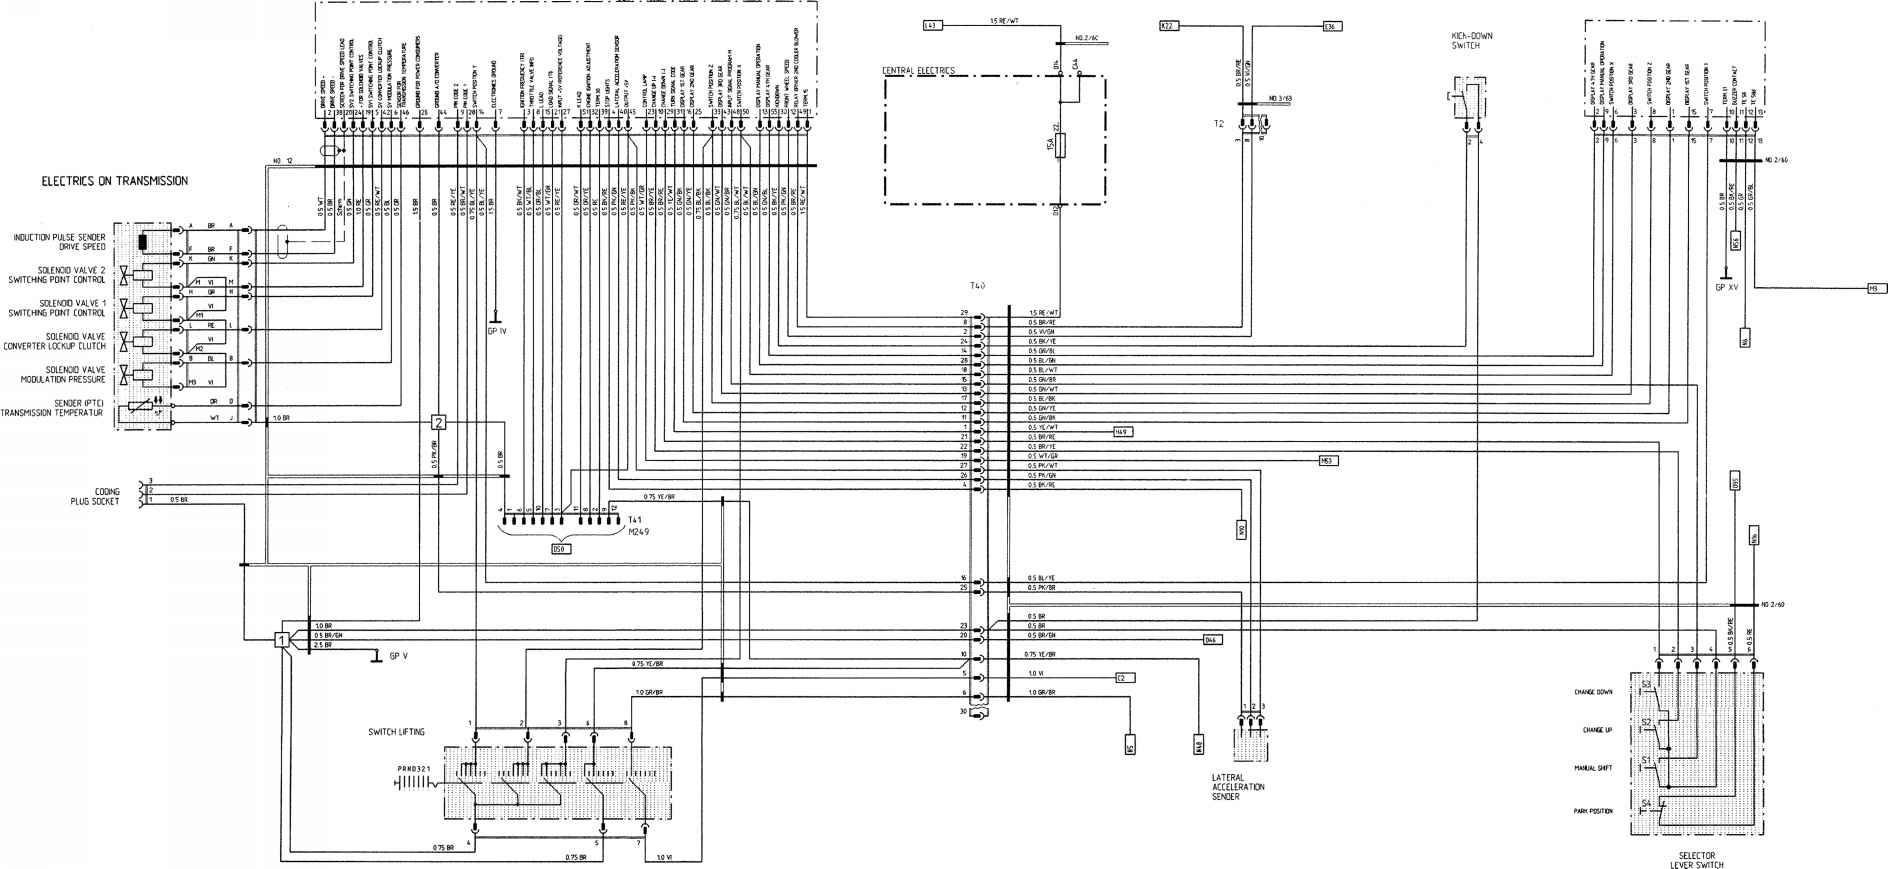 Porsche 996 Turbo Wiring Diagram - Complete Wiring Diagrams •